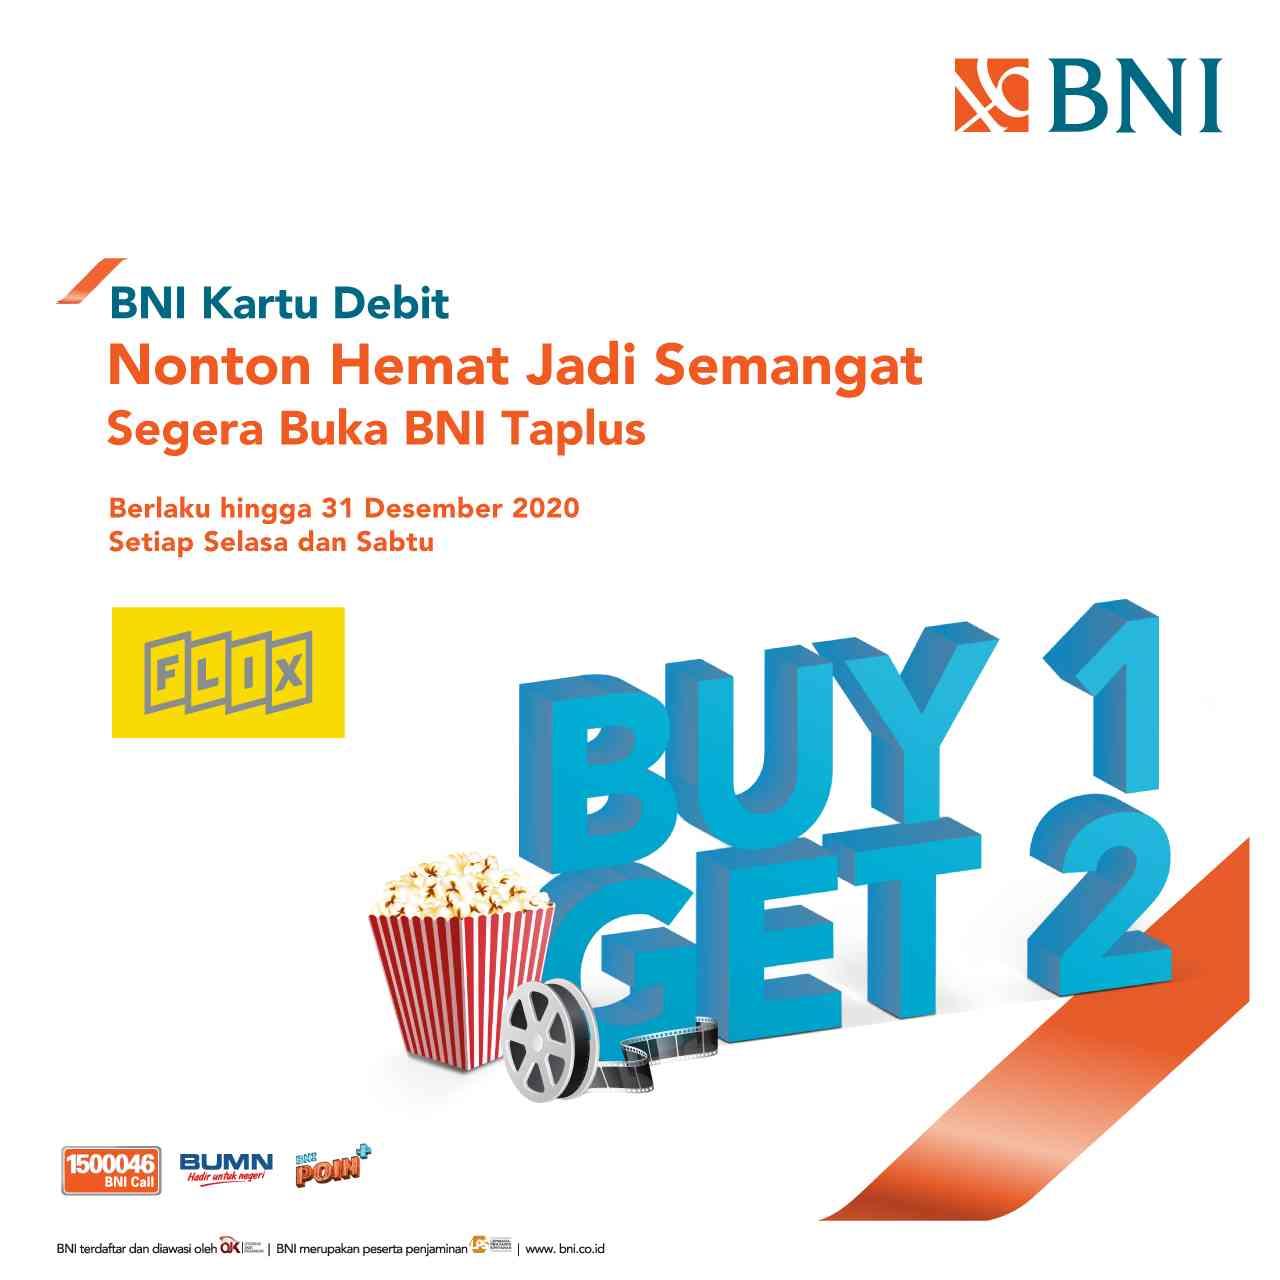 Flix Cinema Promo Buy 1 Get 2 Tiket Nonton Pembayaran Dengan Kartu Debit BNI